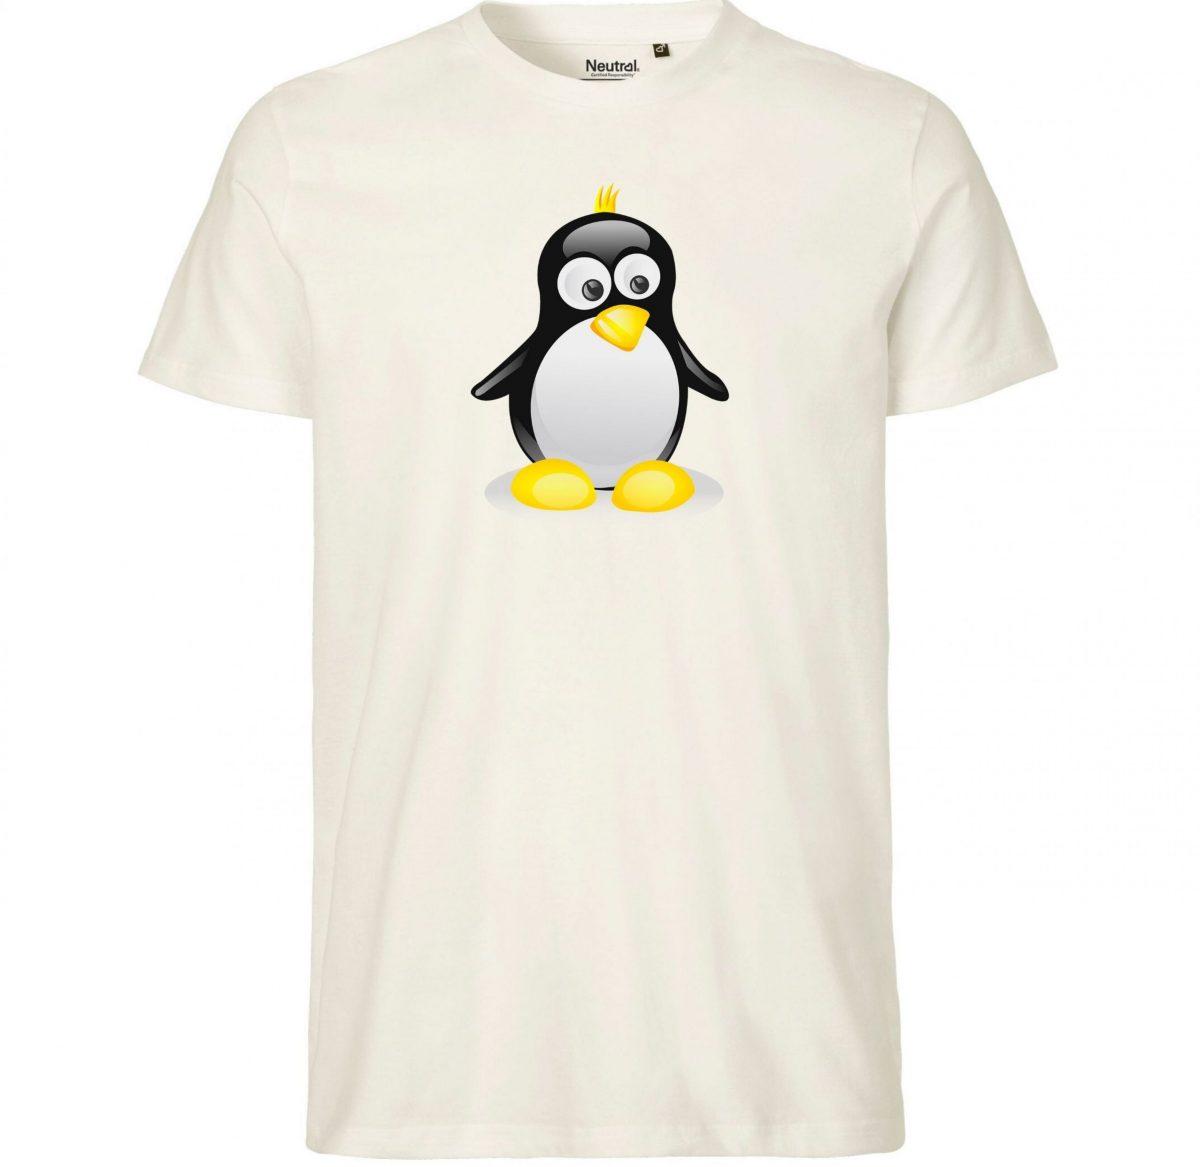 Tee-Shirt Enfant – Bébé Pingouin